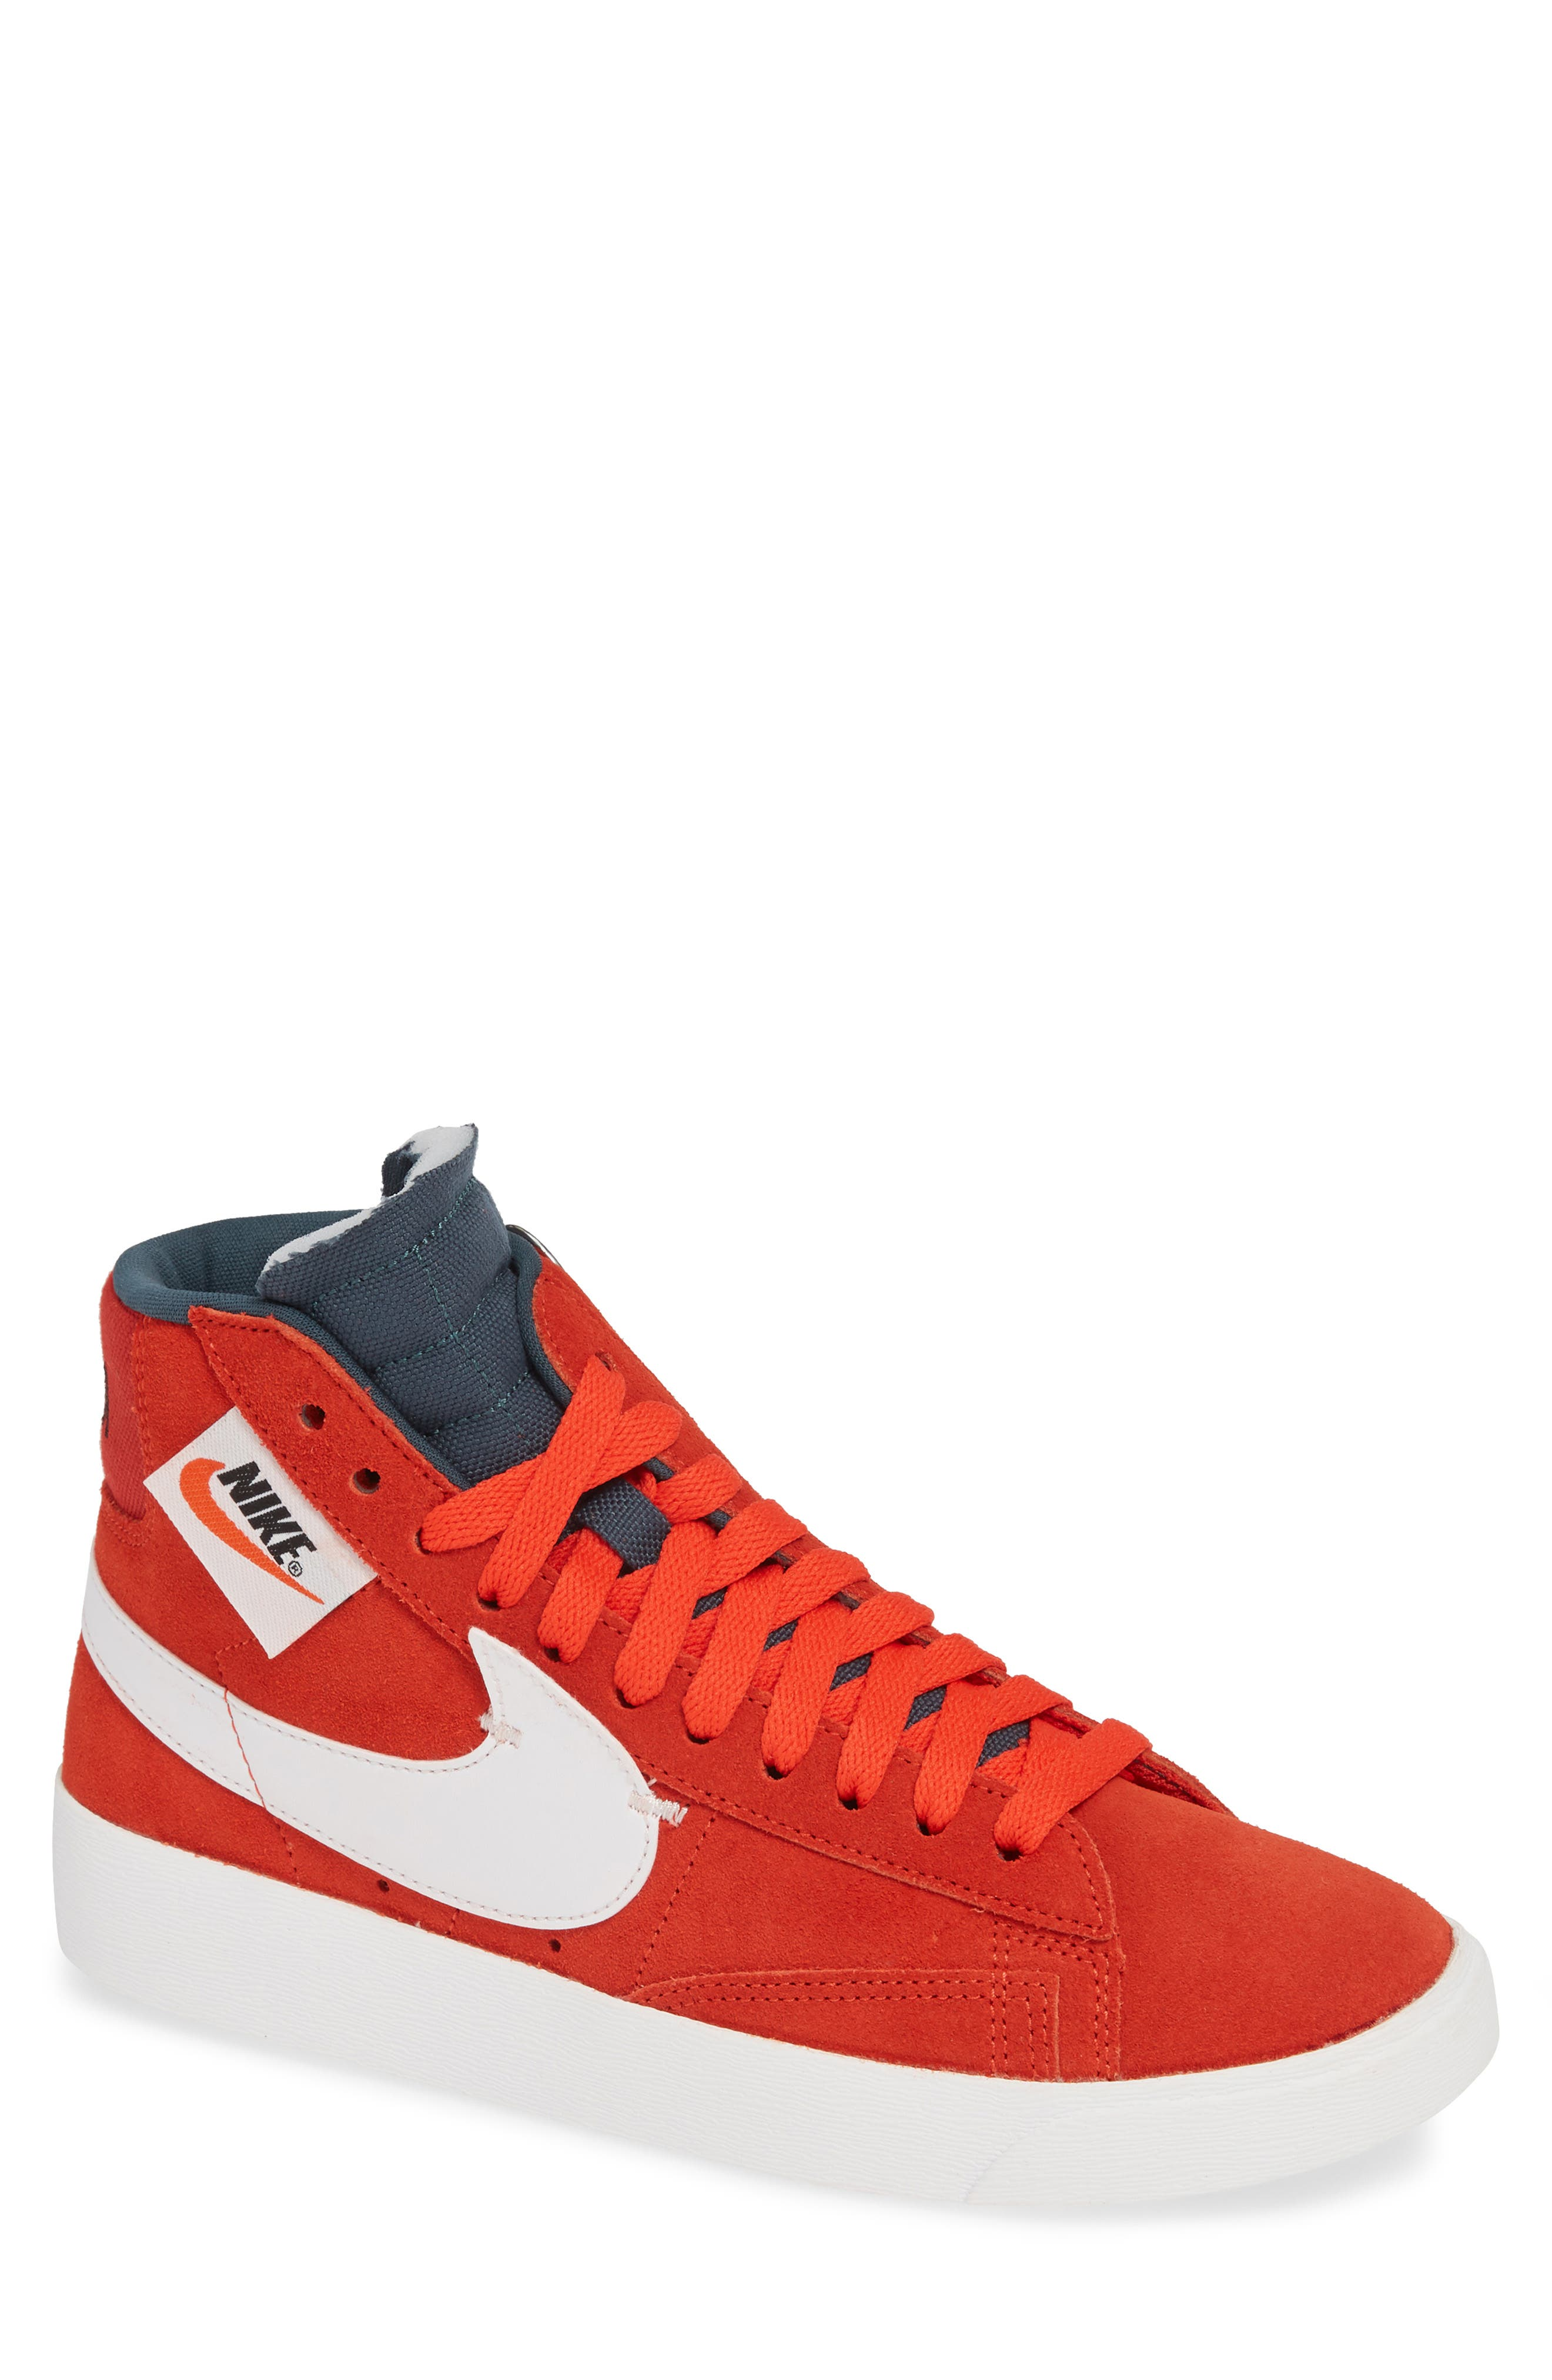 Blazer Mid Rebel Sneaker,                         Main,                         color, HABANERO/ WHITE/ BLACK/ SPRUCE